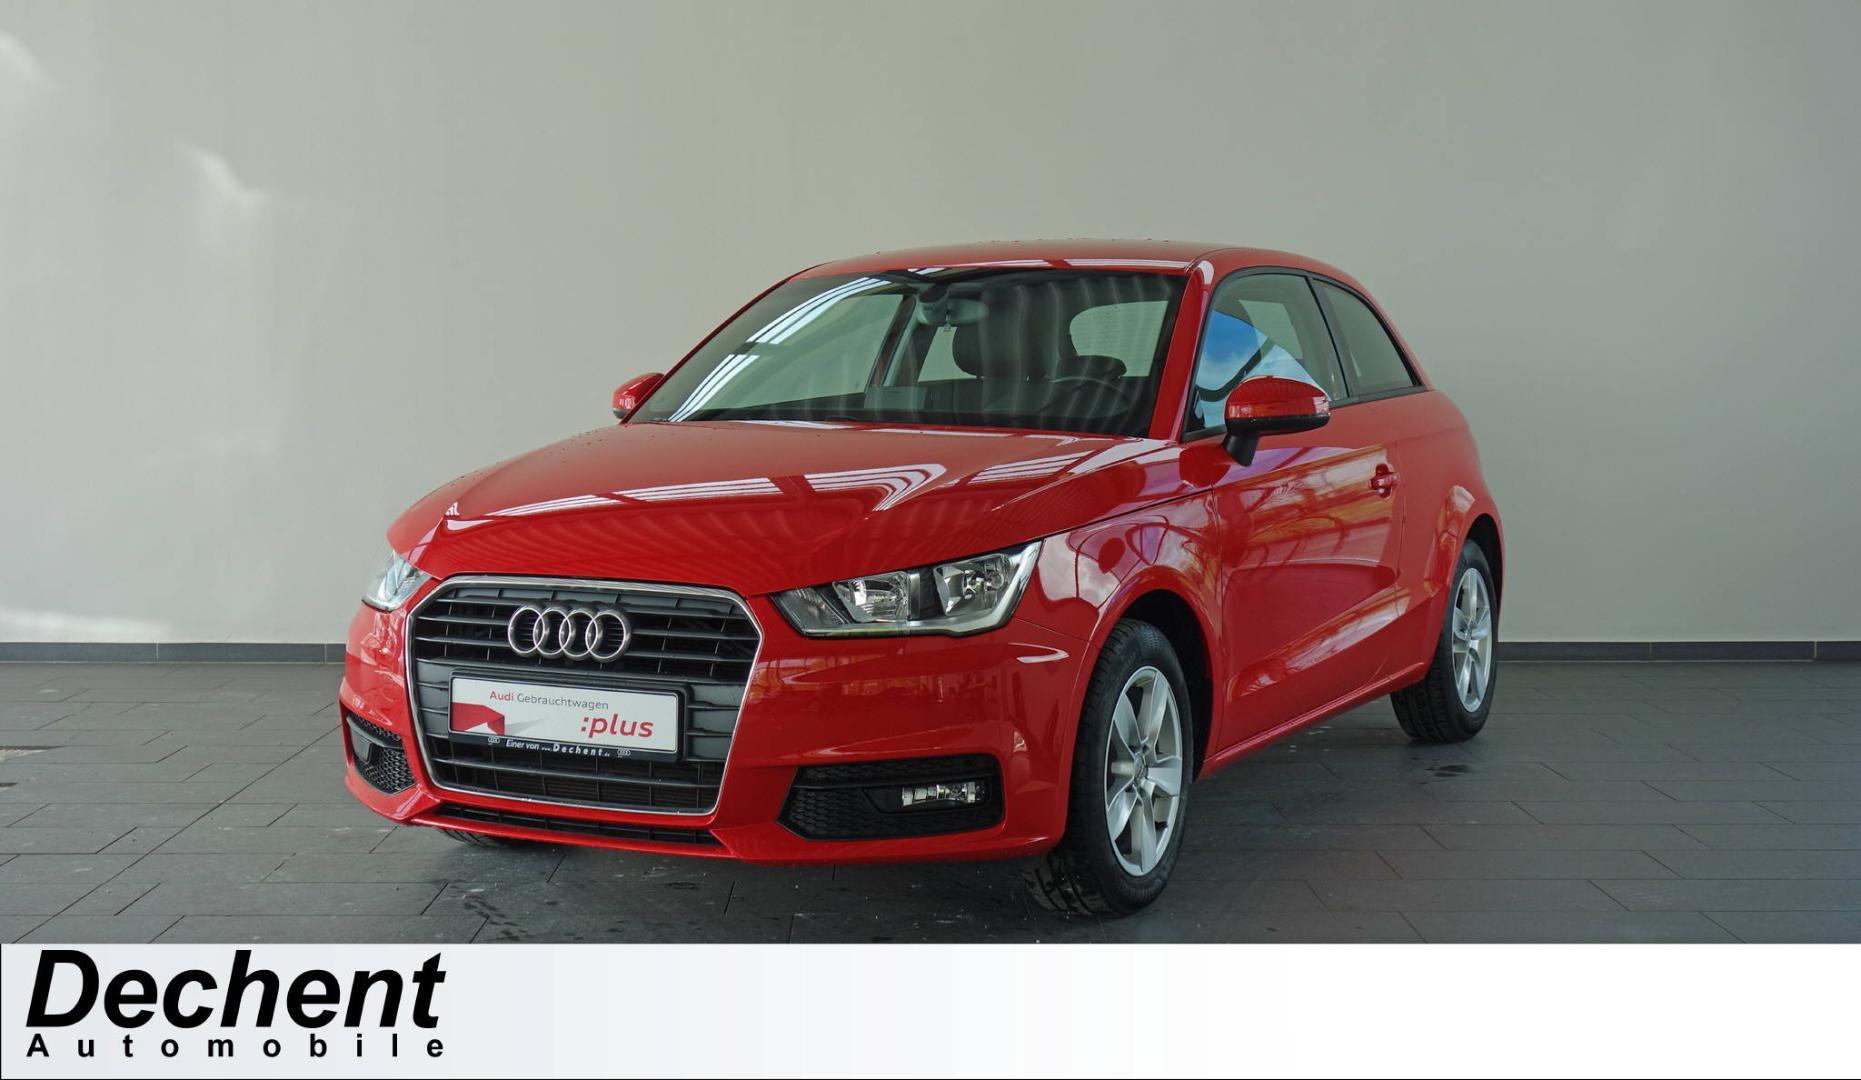 Audi A1 1.0 TFSI media Paket, Alu, APS, Shzg., Klimaa, Jahr 2016, Benzin